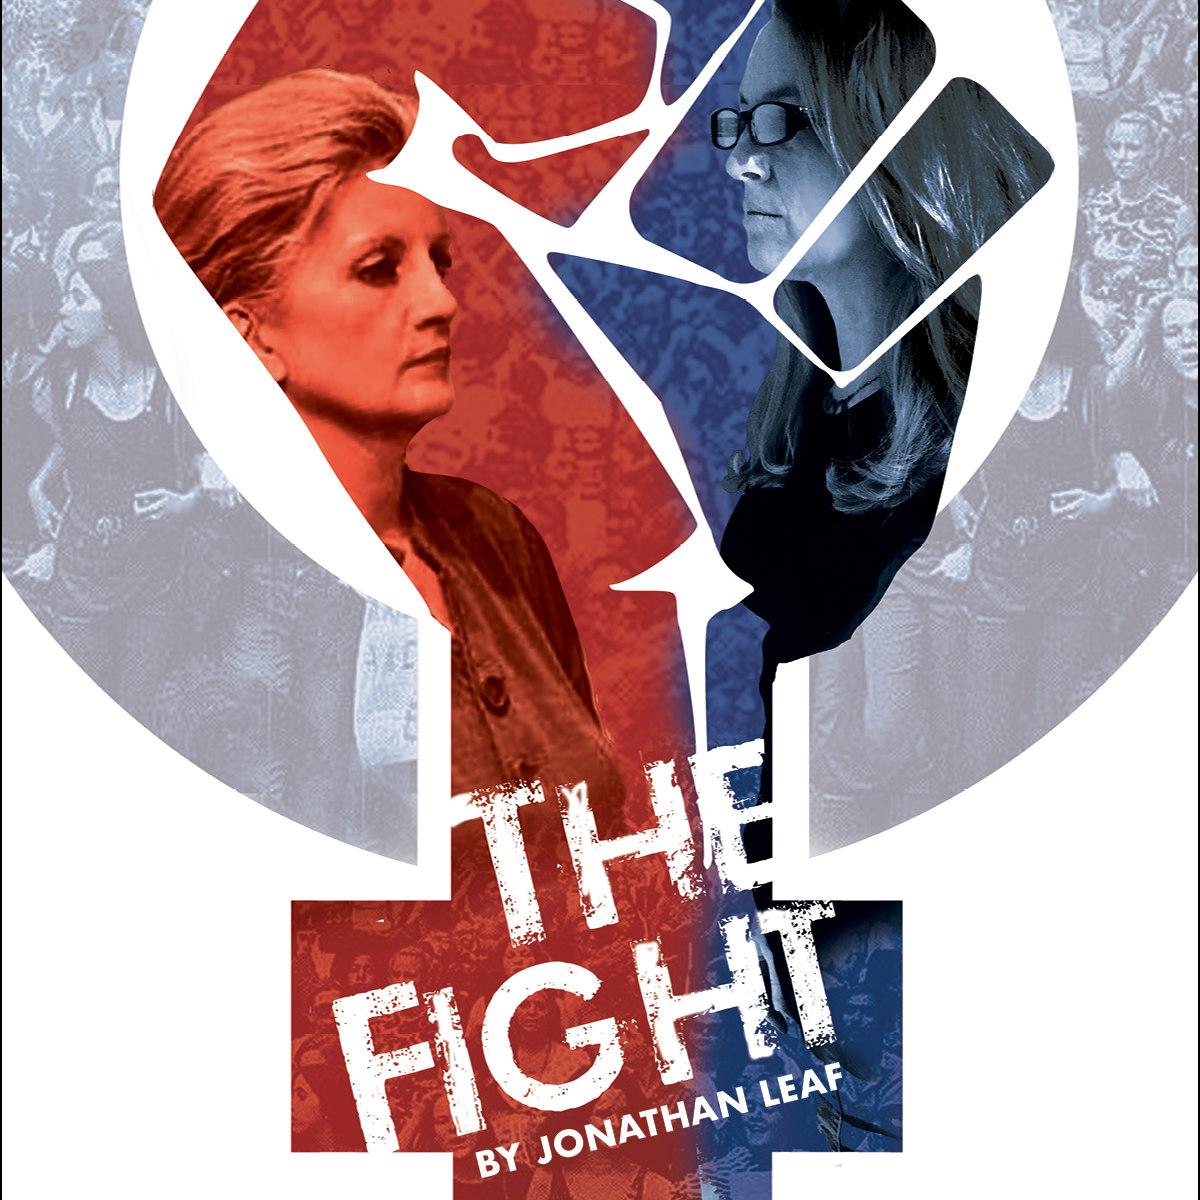 CF_The fight 4x6card_6b.jpg